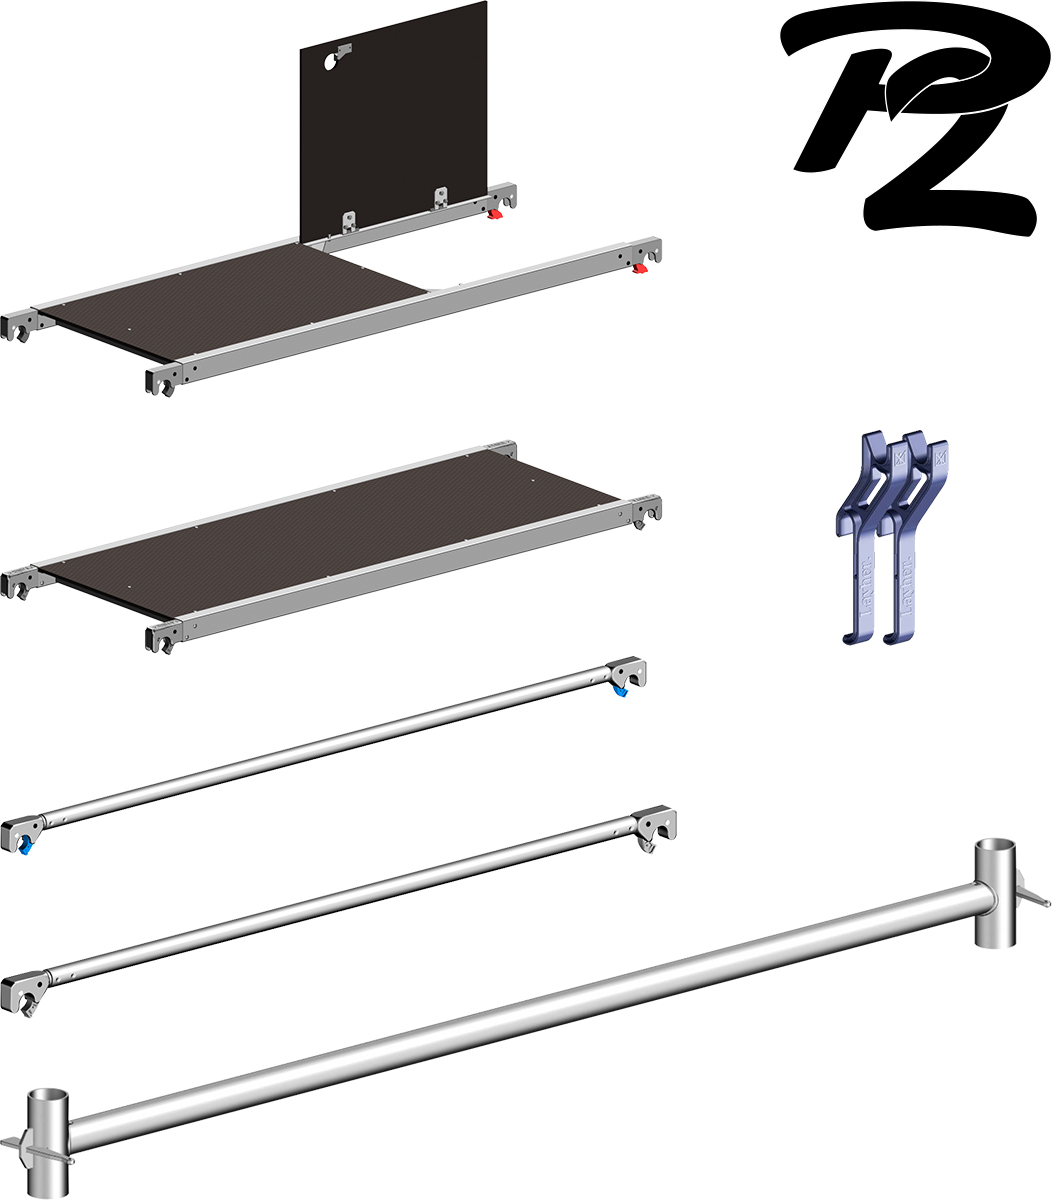 Layher Fahrgerüst Uni Kompakt P2 Nachrüst-Set 5008